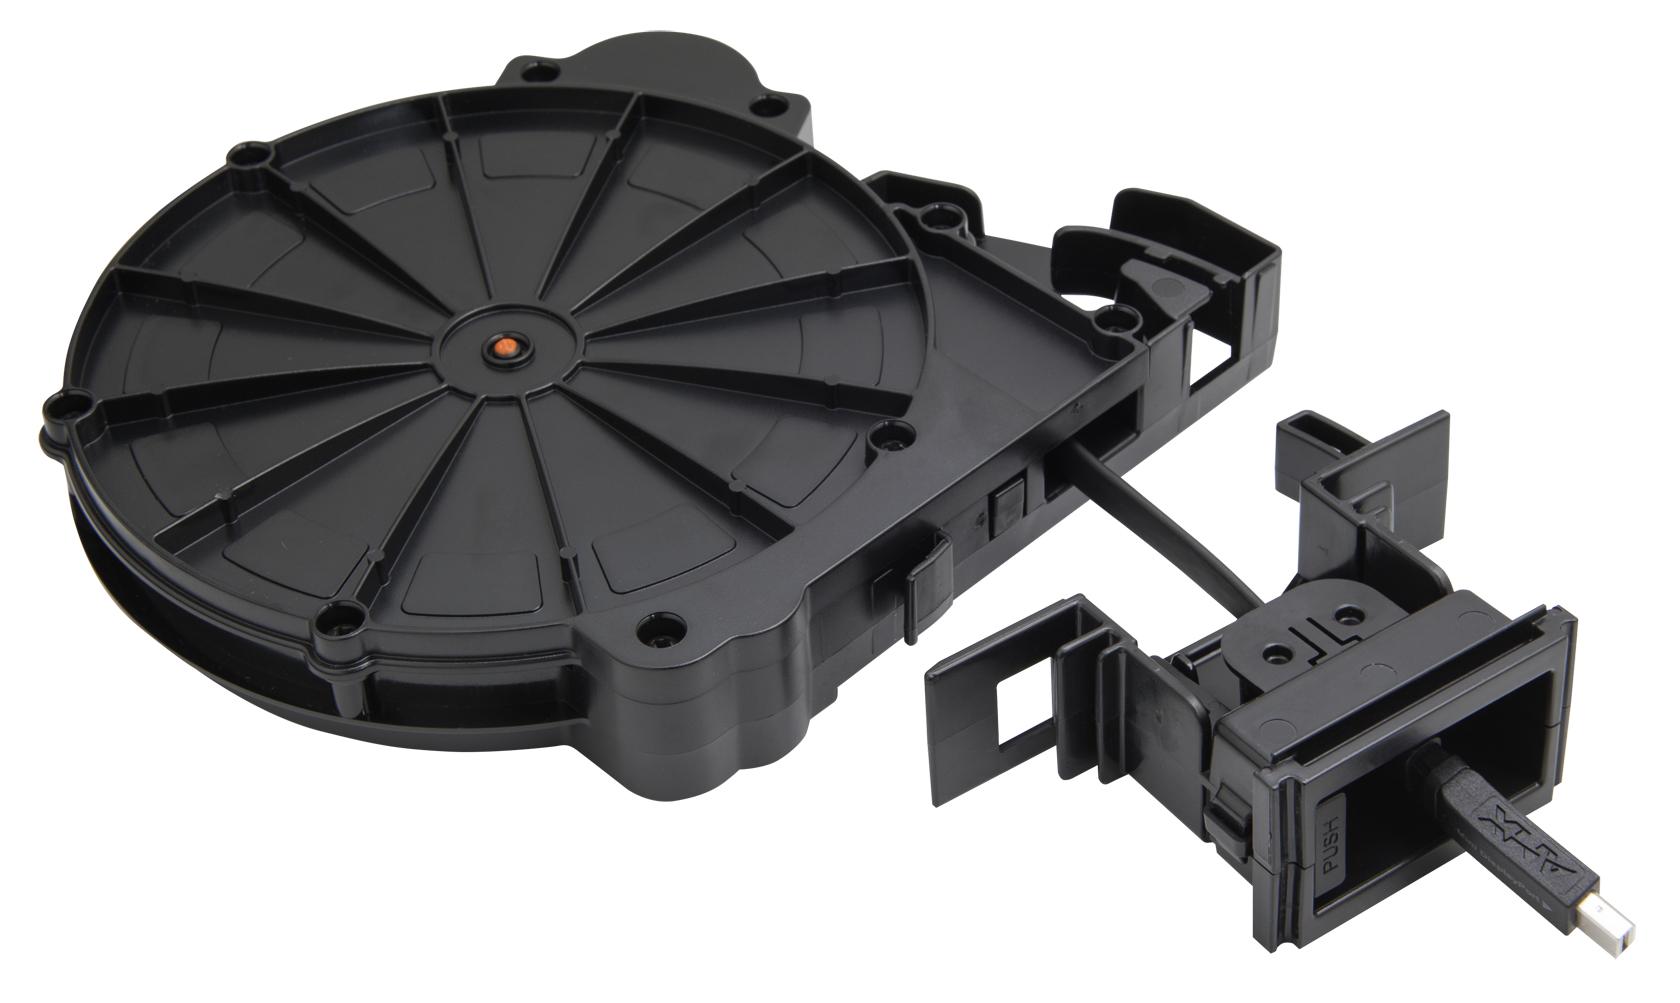 Hpx-av101-hdmi-r Single Hdmi Module With Retractable Cable